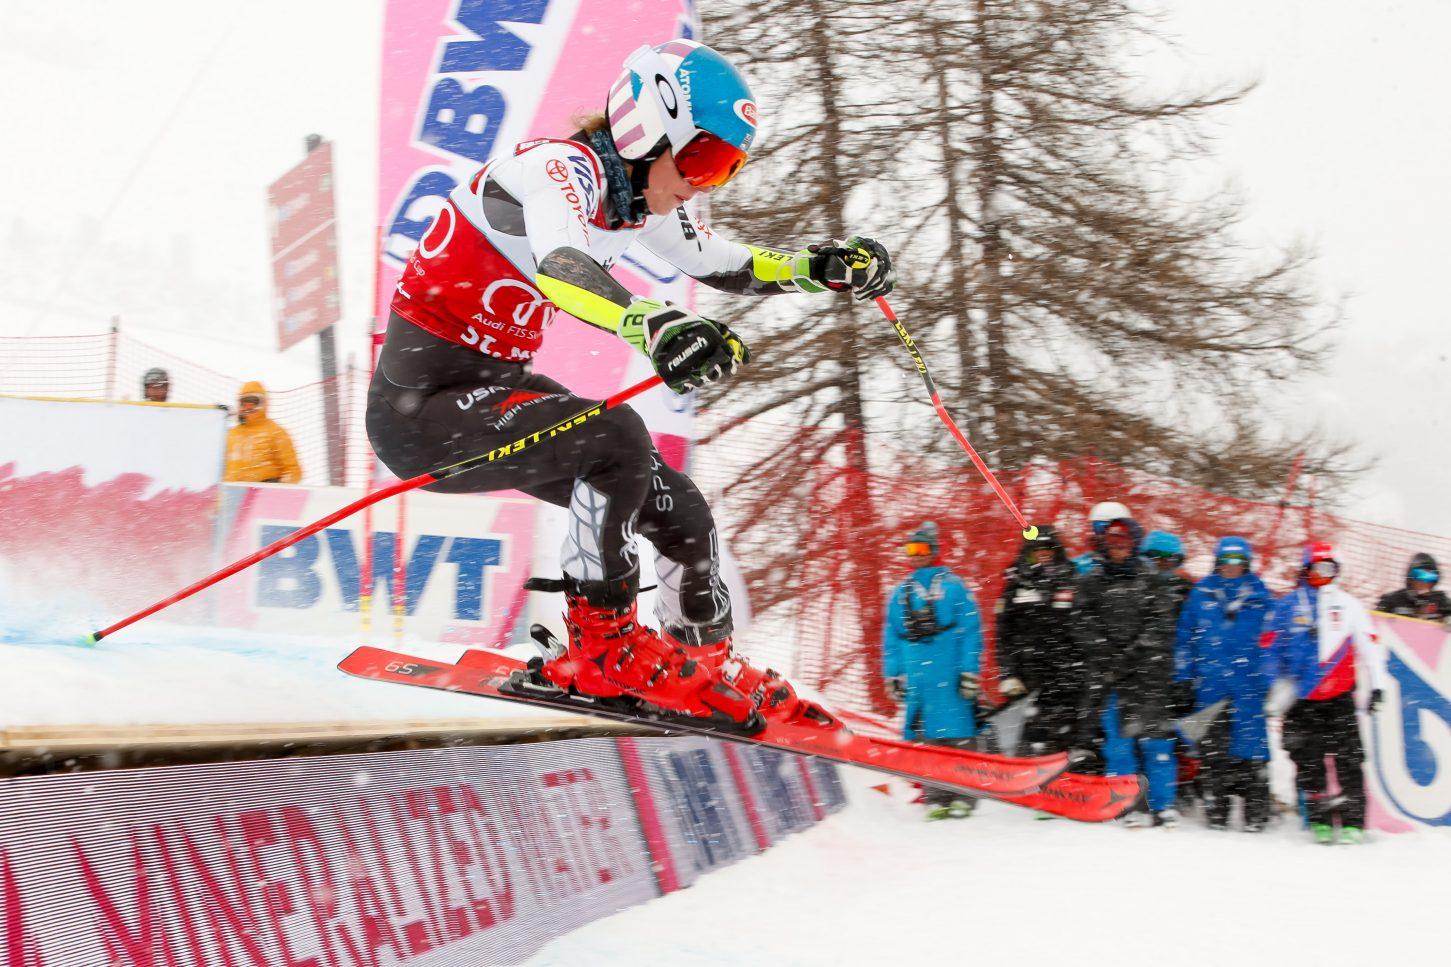 Audi FIS Alpine Ski World Cup - Women's Parallel slalom Getty Images